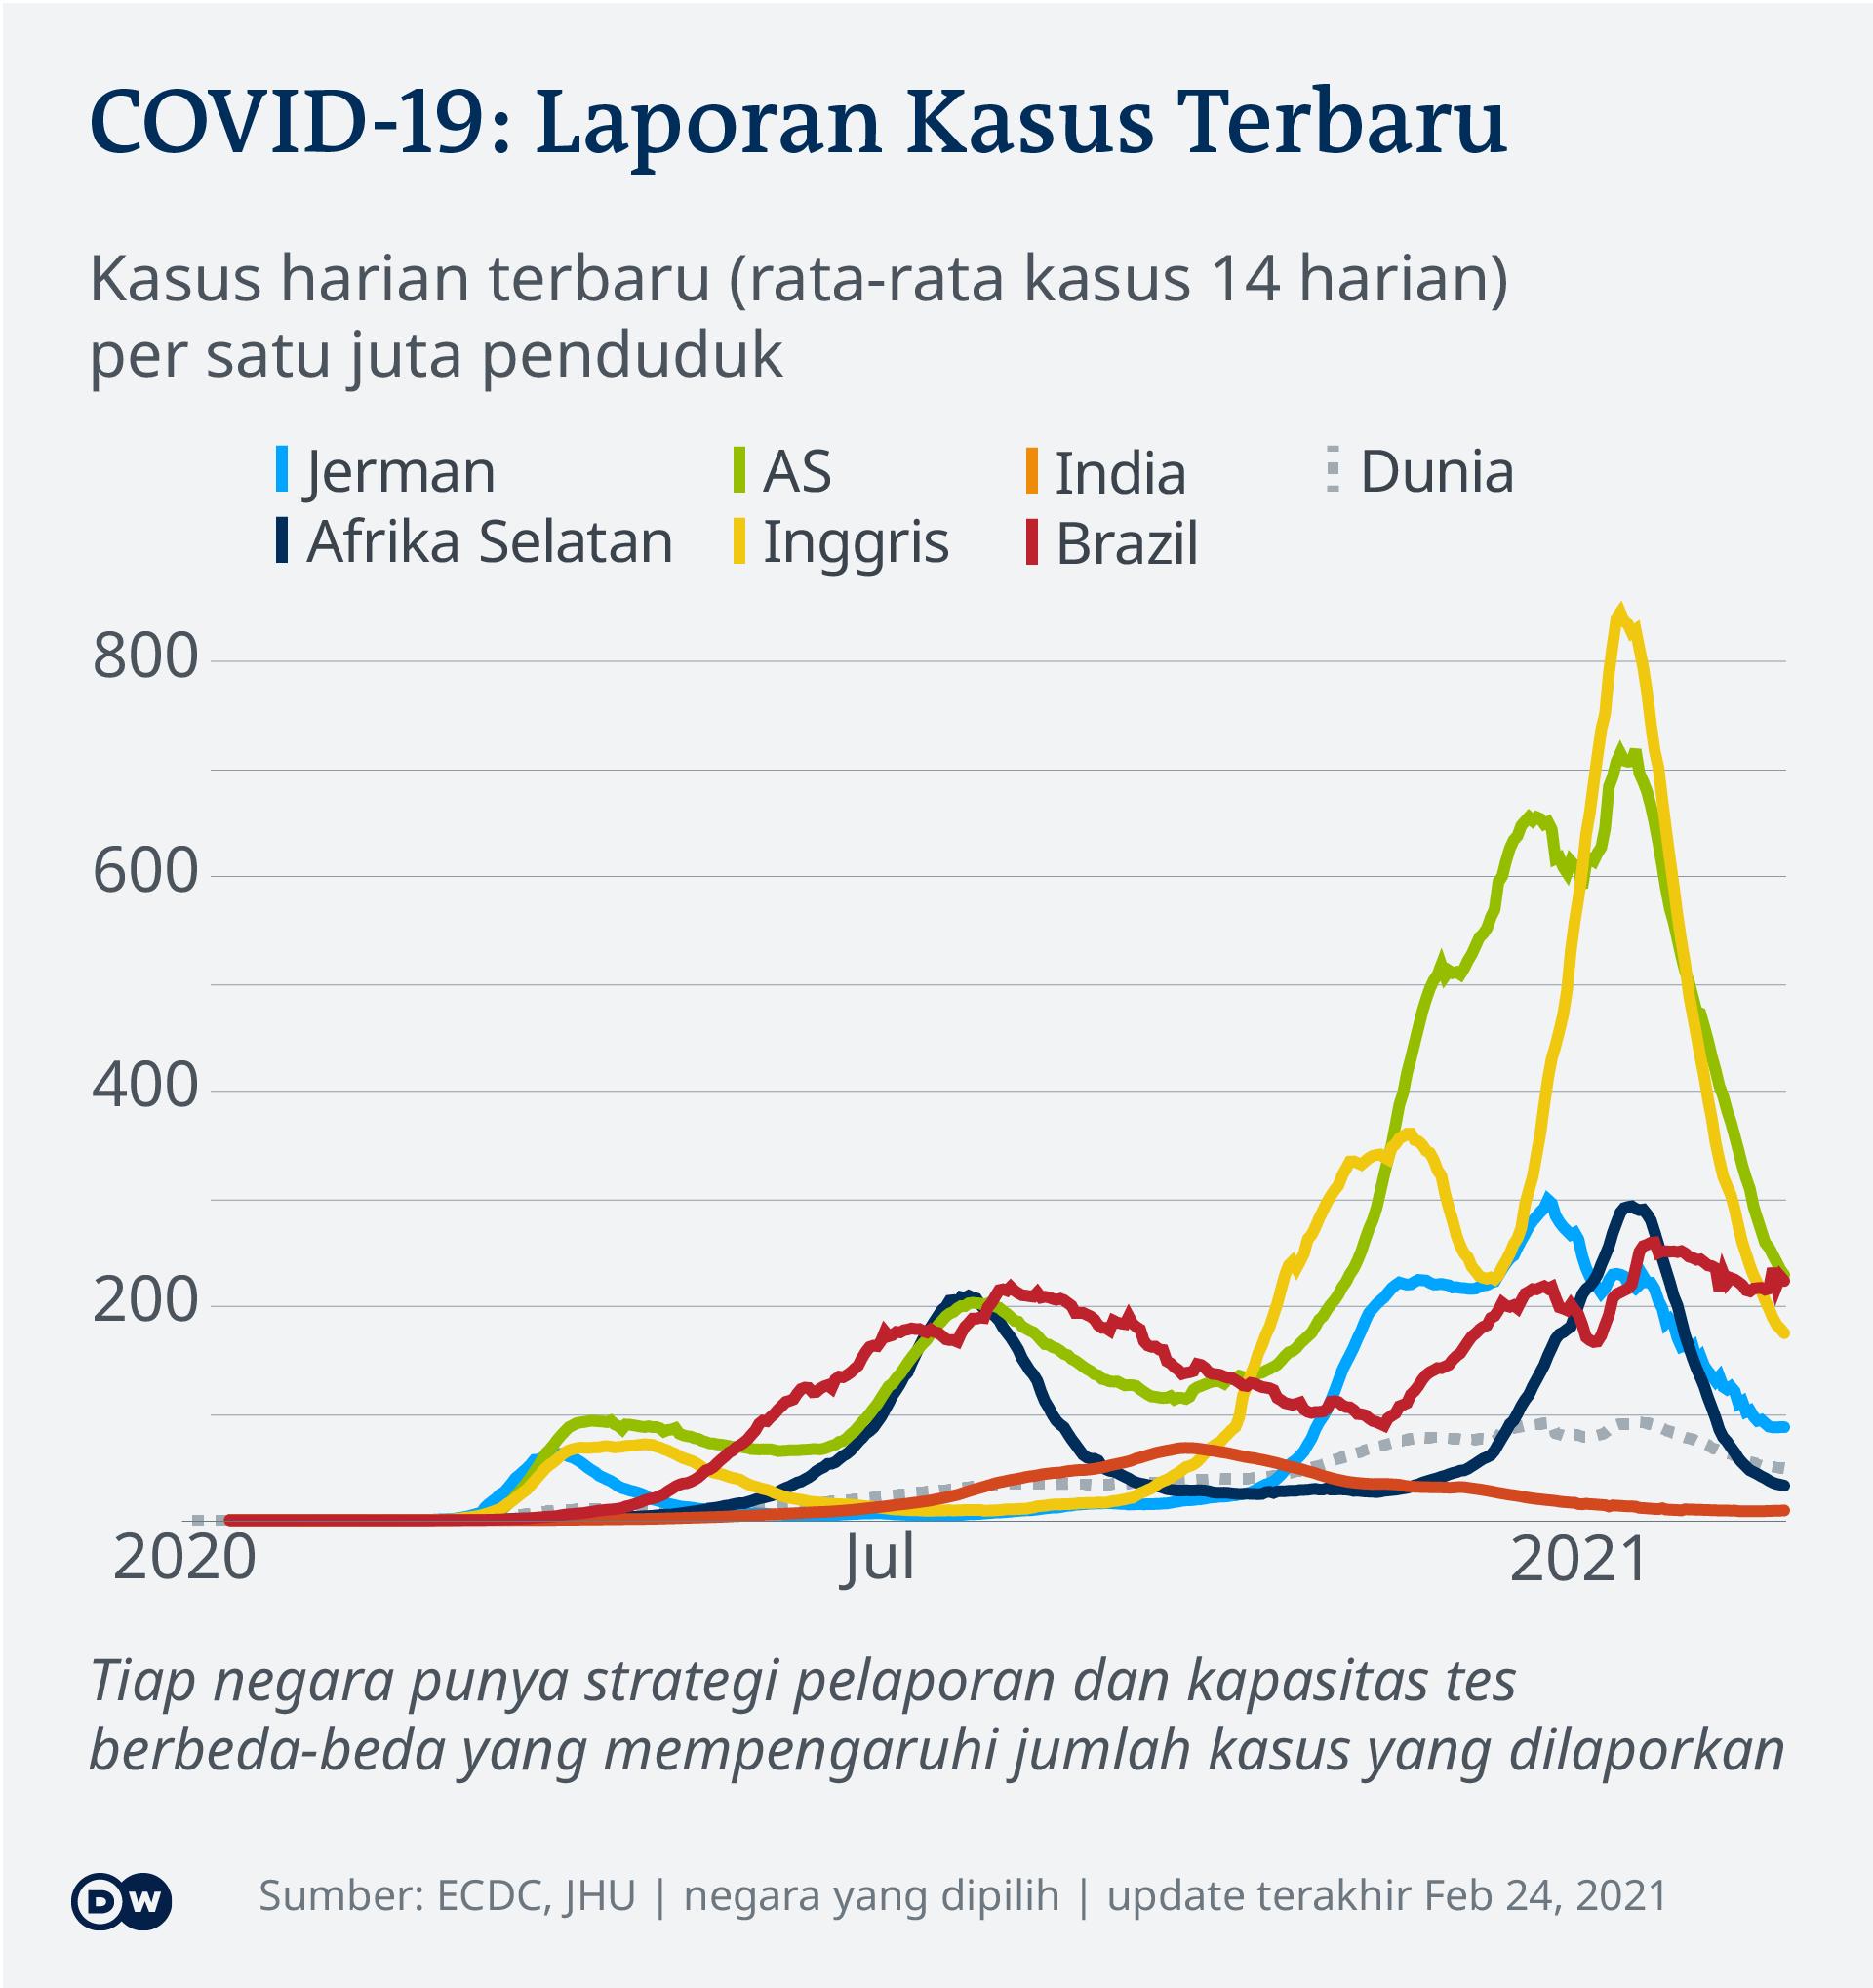 Data kasus harian baru COVID-19 di beberapa negara tiap satu juta penduduk, per 24 Februari 2021